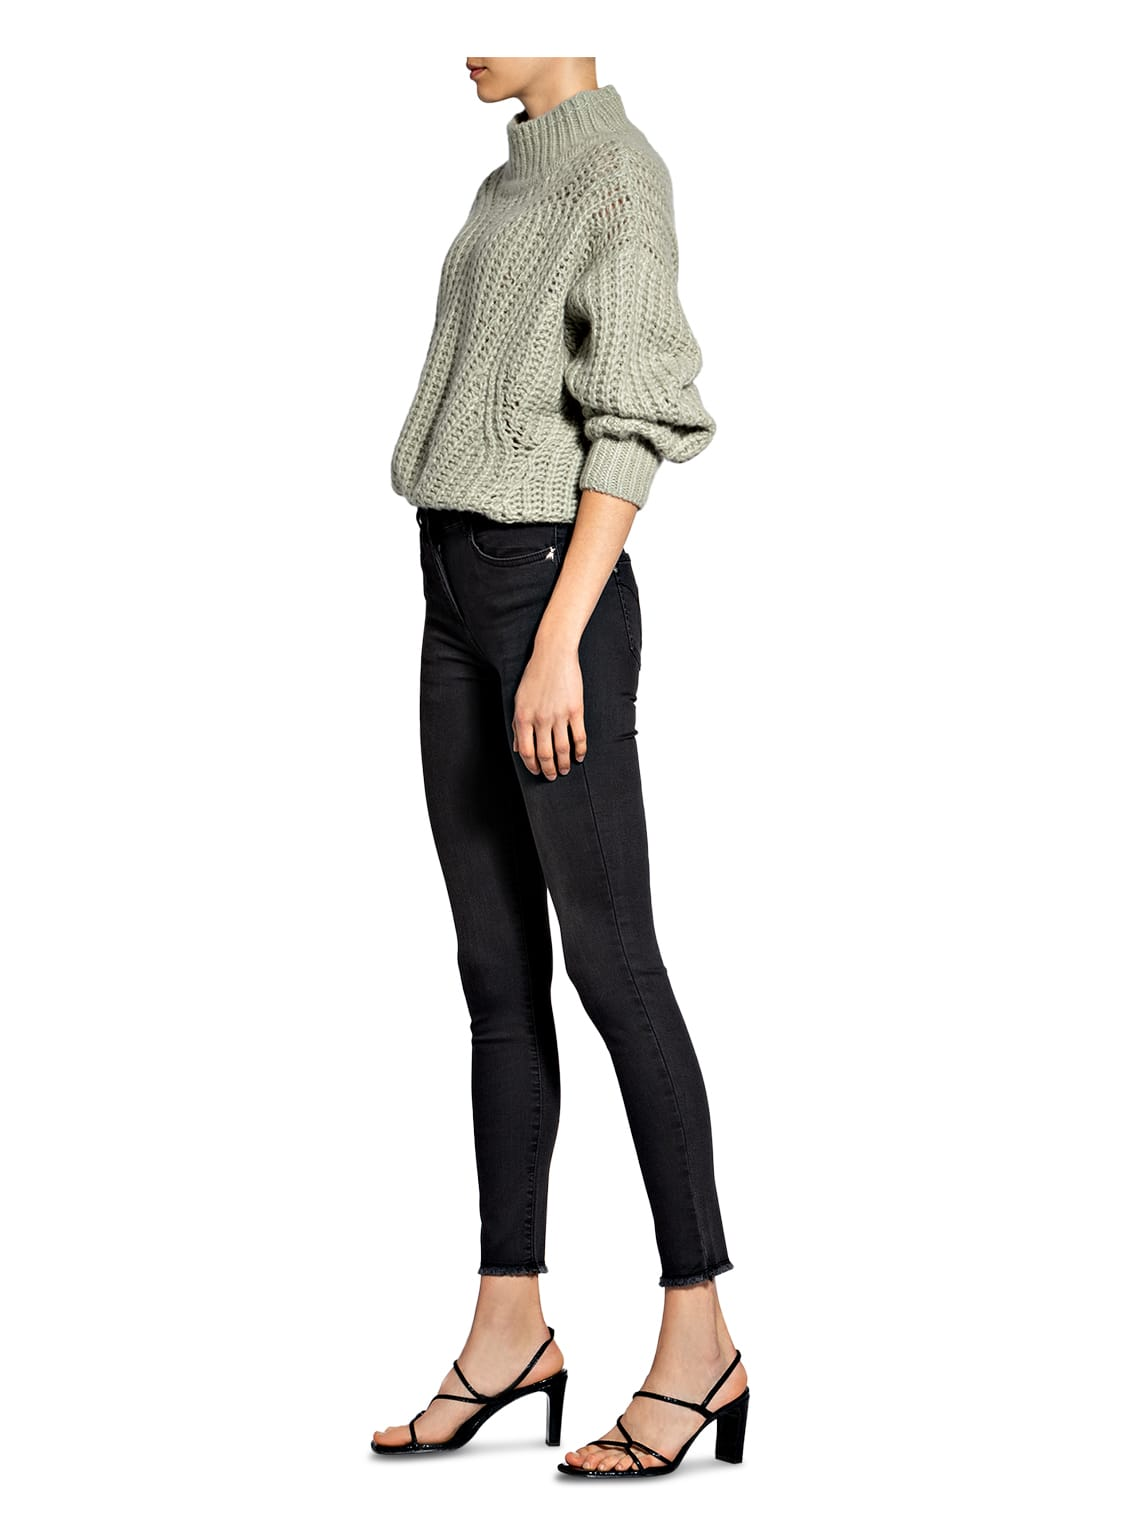 Damen Bekleidung Skinny Jeans von PATRIZIA PEPE